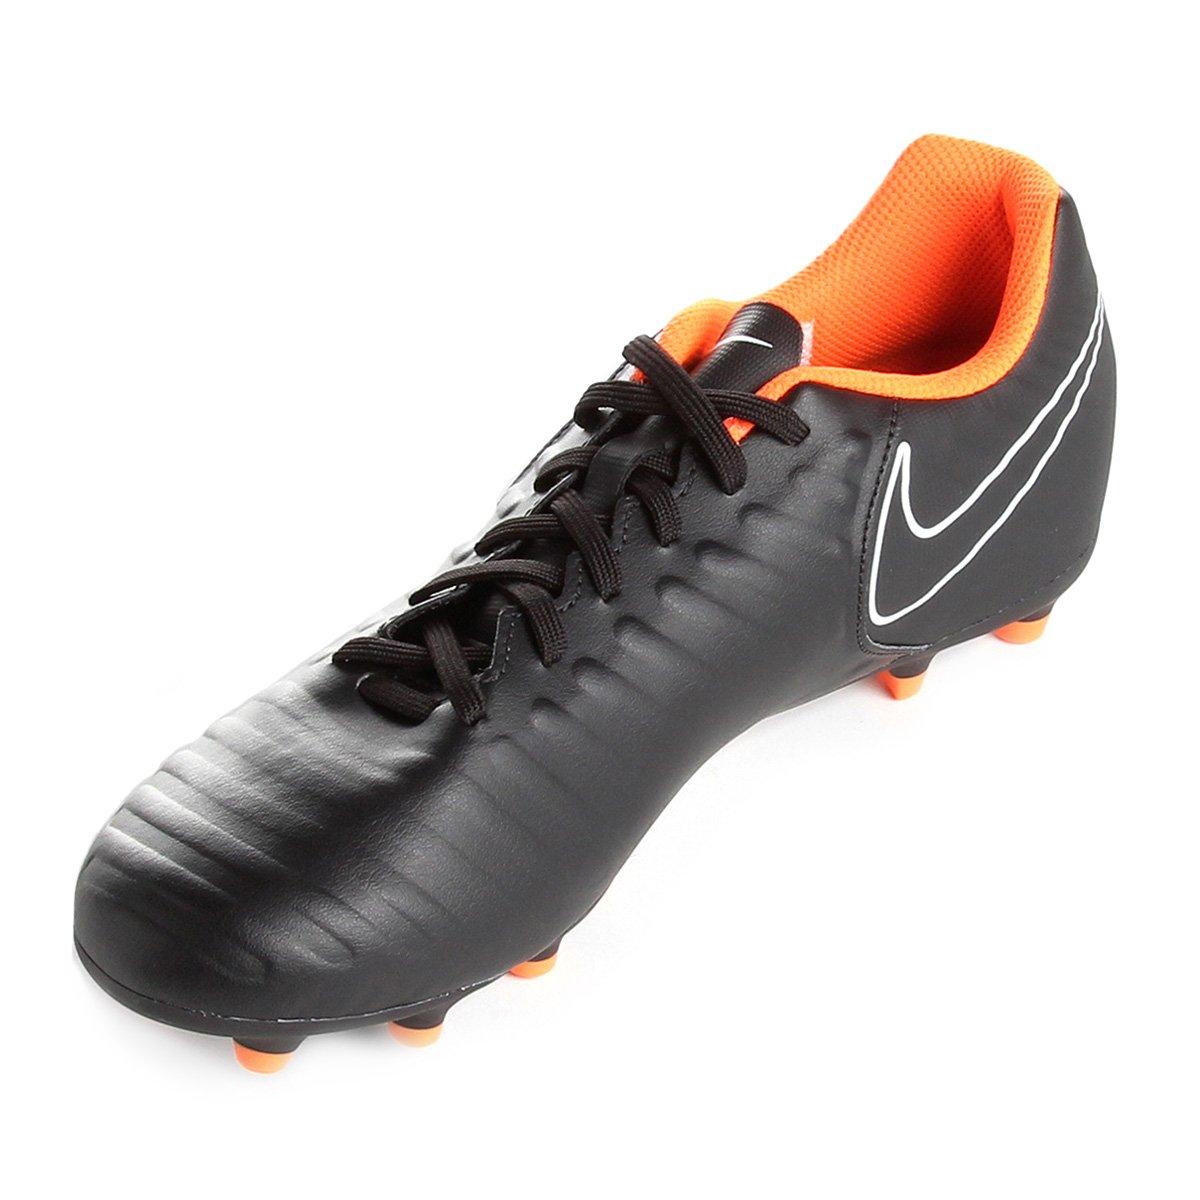 Chuteira Campo Nike Tiempo Legend 7 Club FG - Preto e Laranja ... e7cd7dc1b9ee7